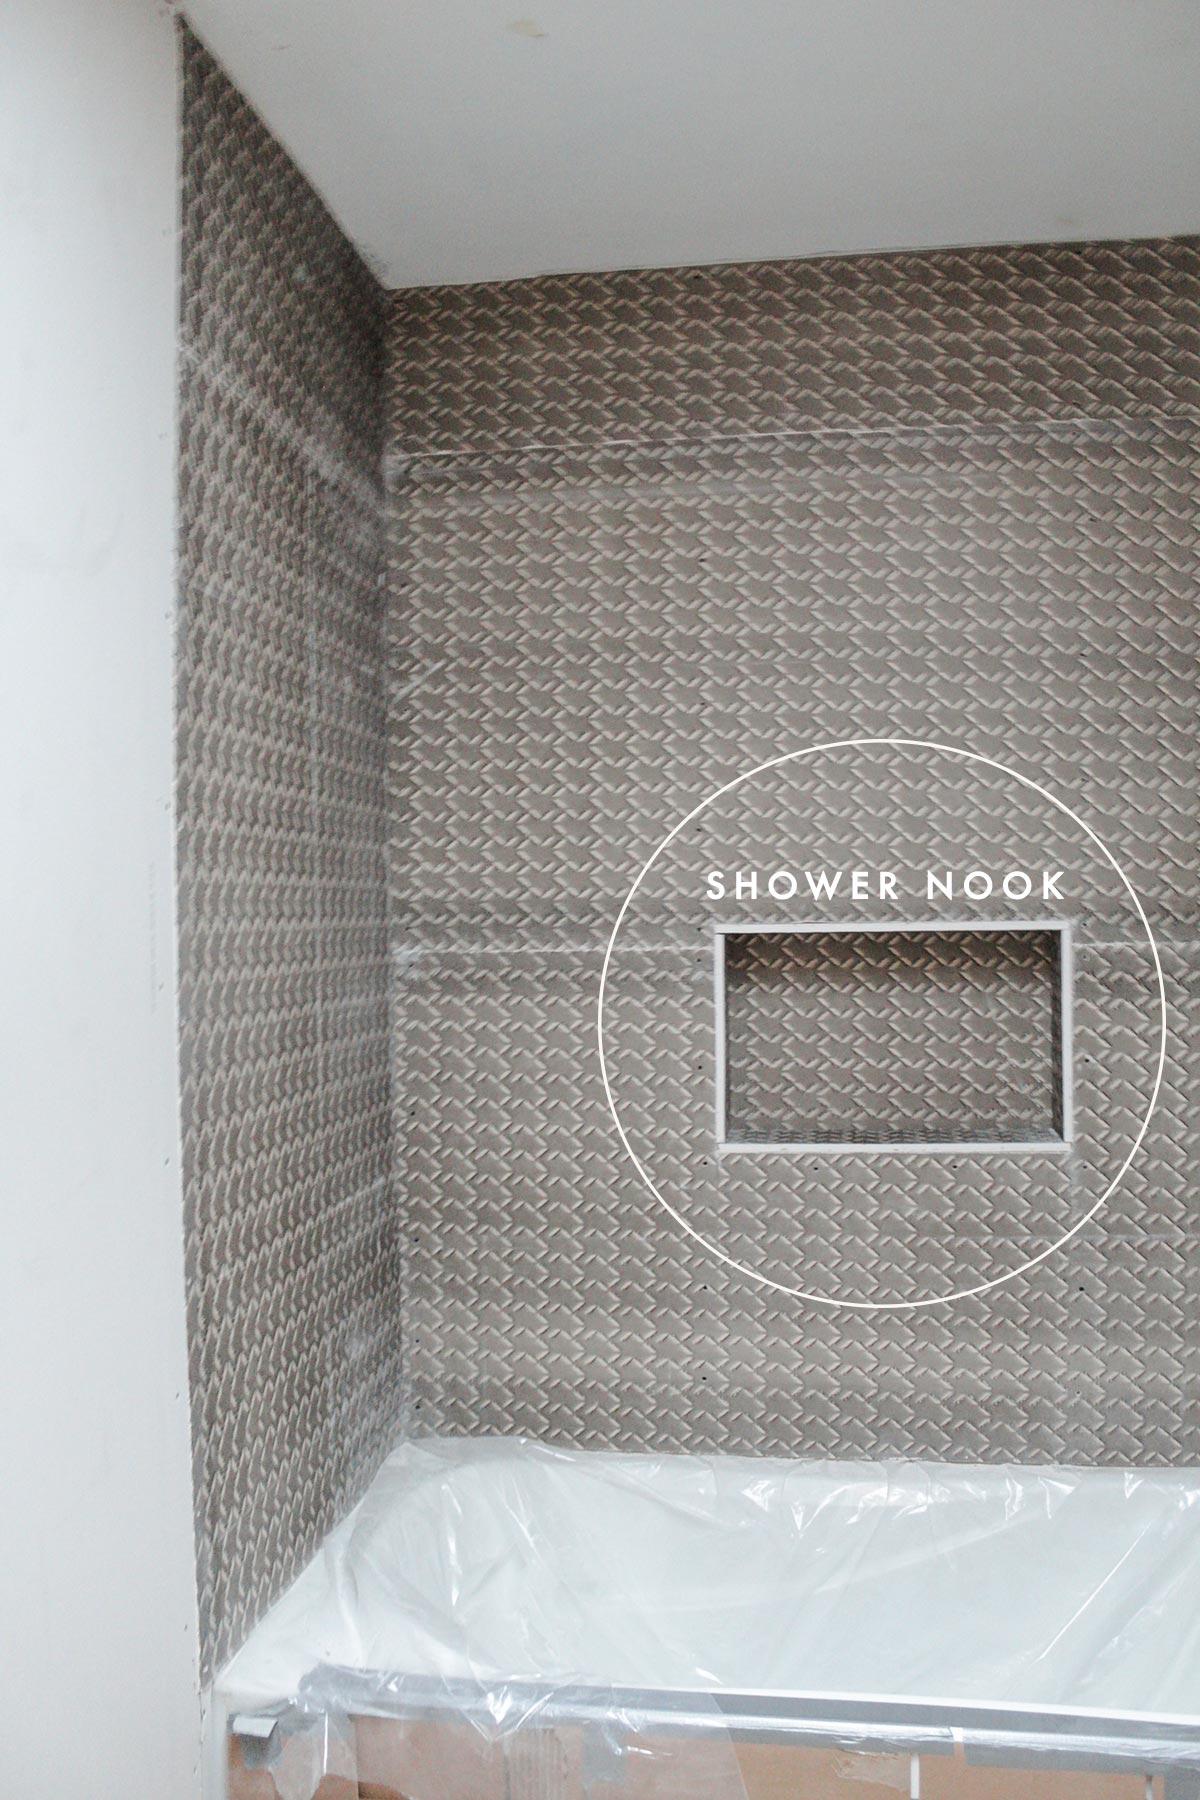 Shower-Progress-built-in-nook.jpg